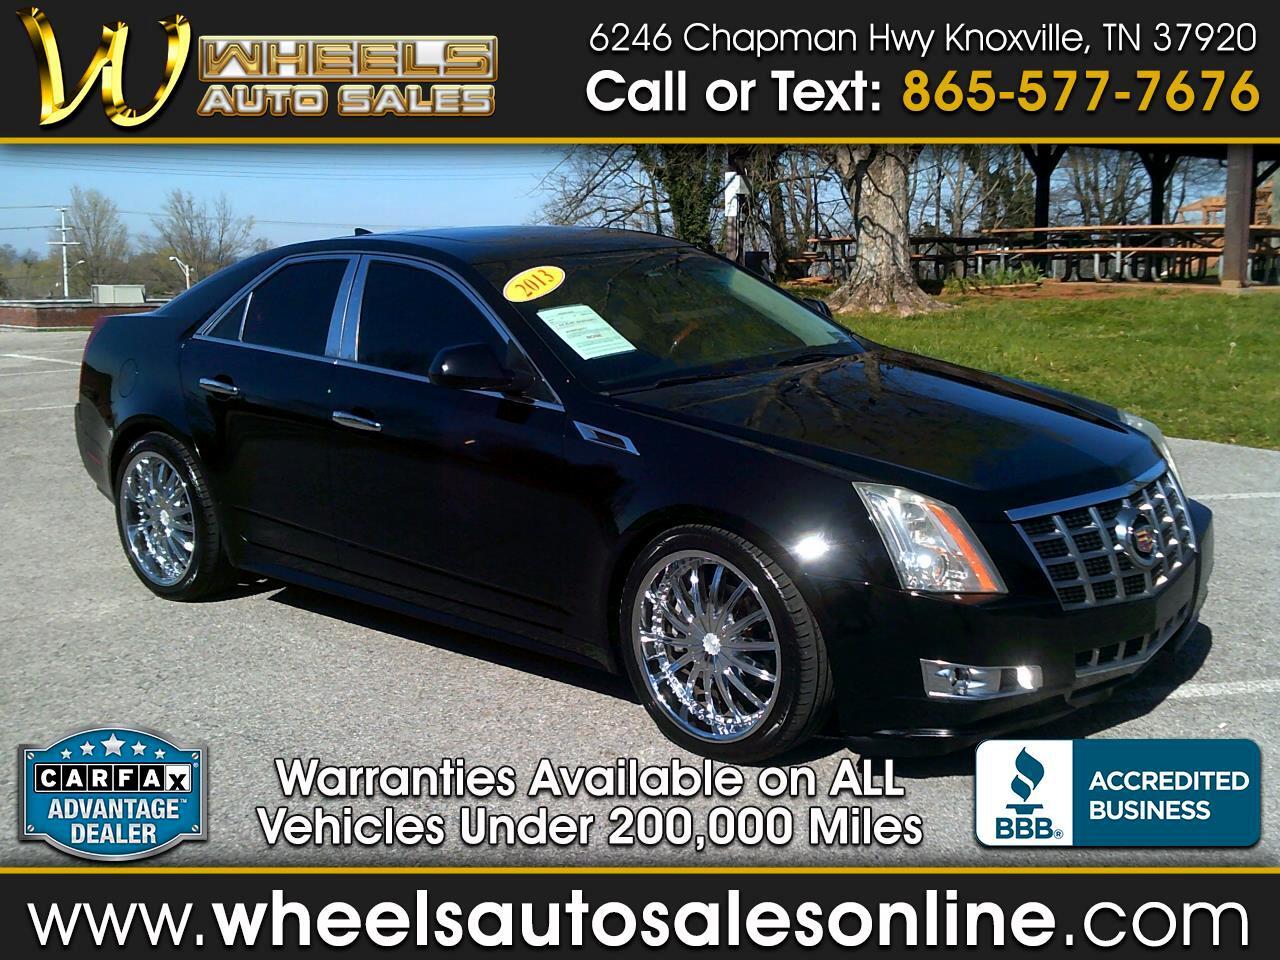 2013 Cadillac CTS Sedan 4dr Sdn 3.6L Premium RWD